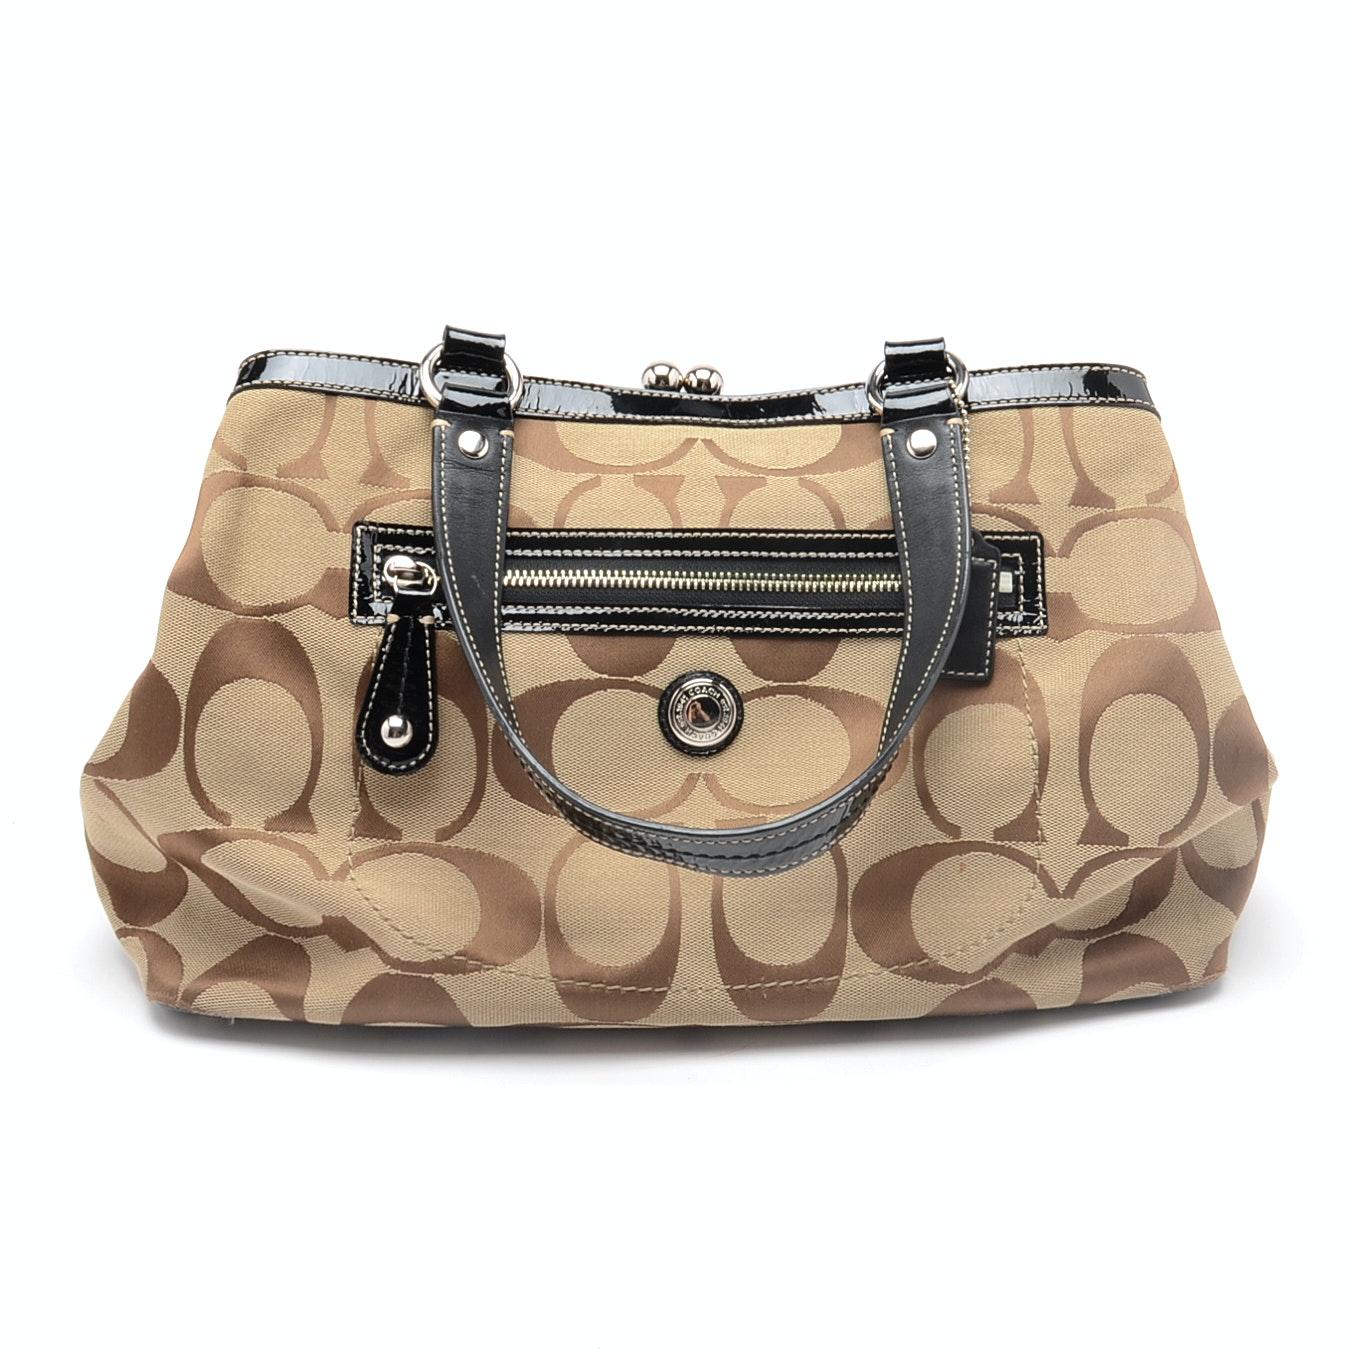 Coach Signature Style Handbag